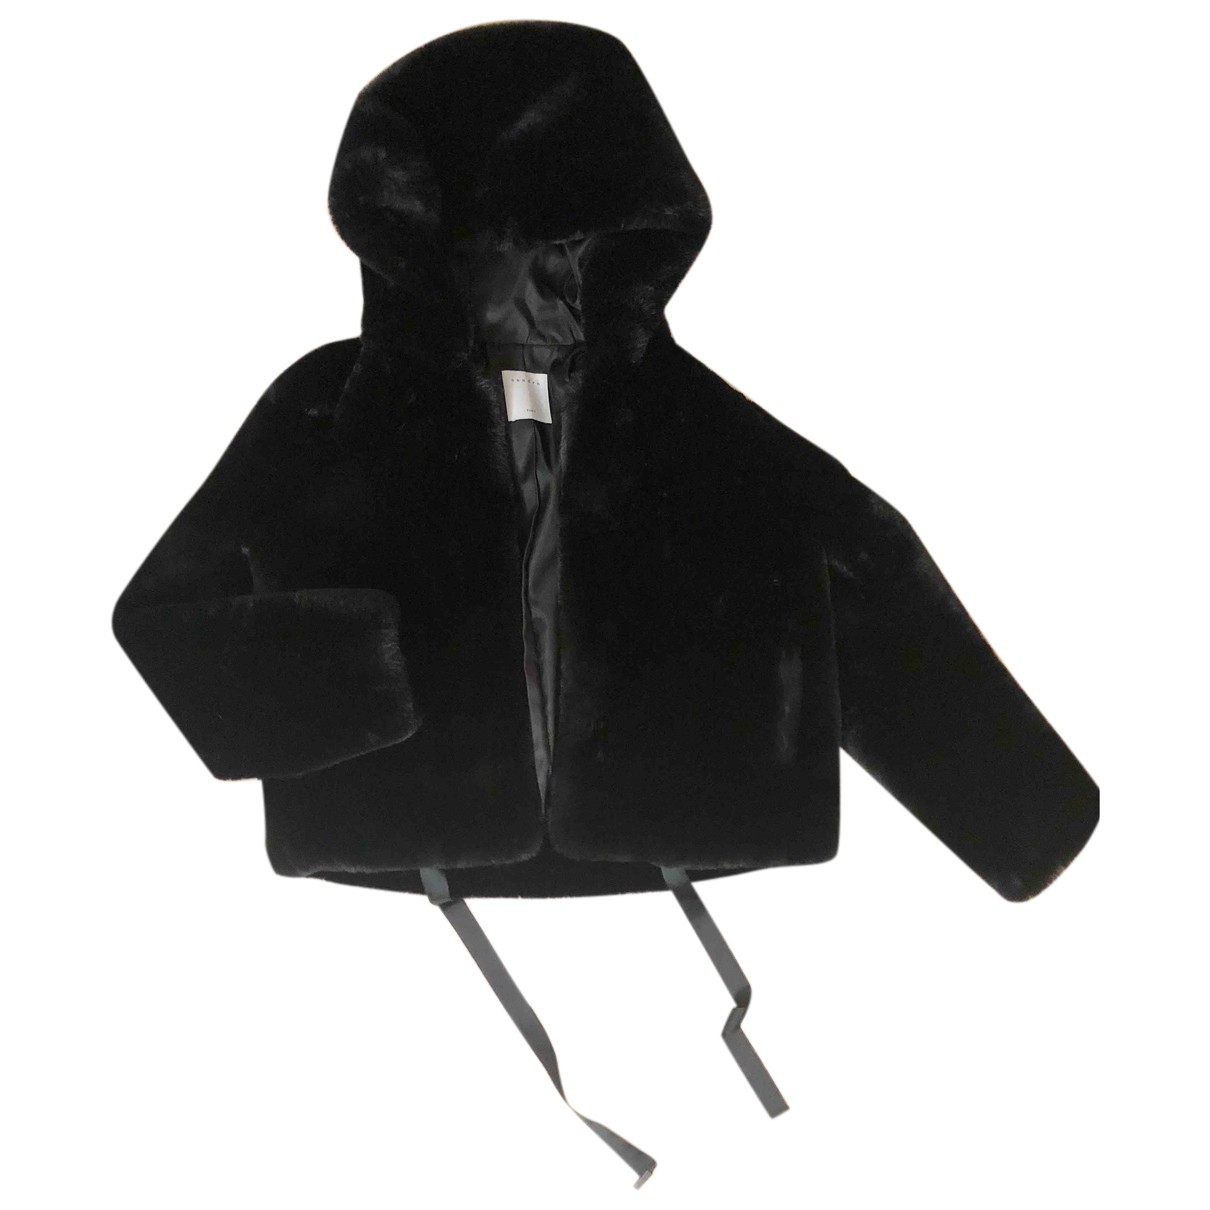 Sandro Fall Winter 2019 Black Faux fur coat for Women 36 FR